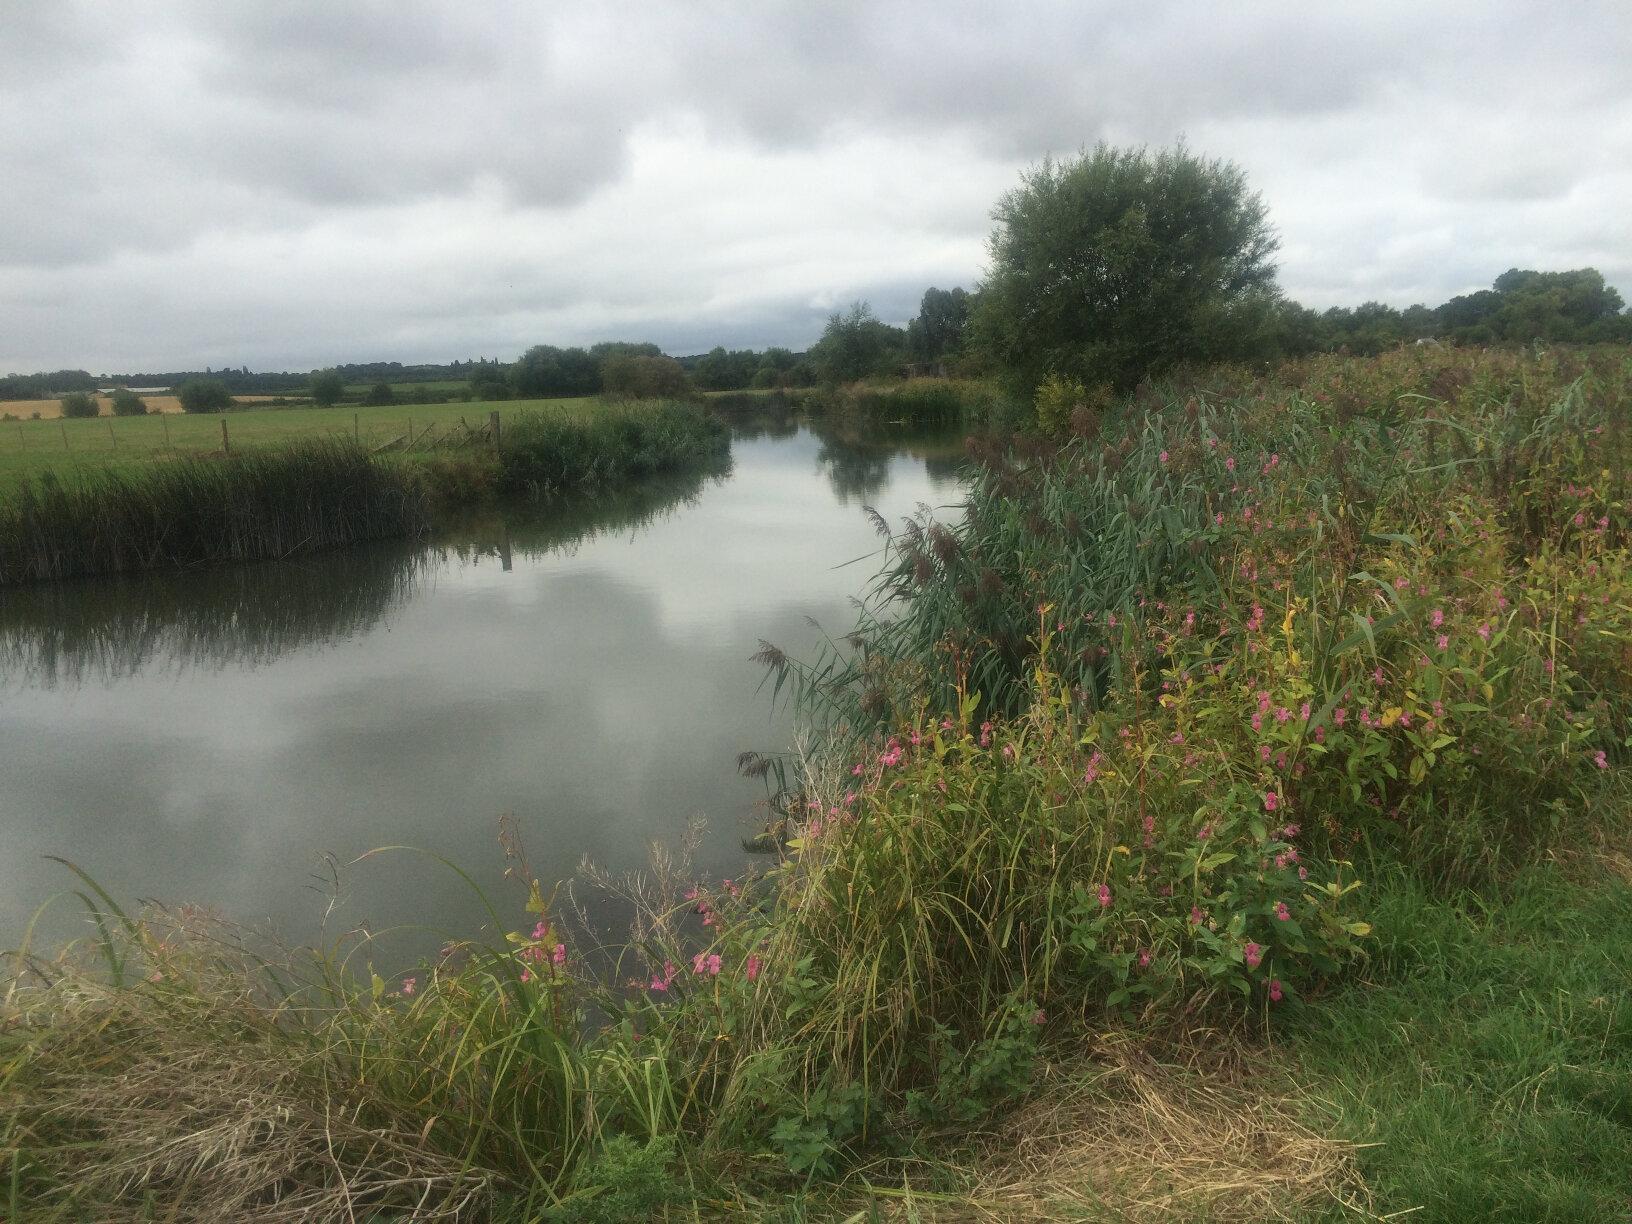 From Lechlade to Newbridge (21)